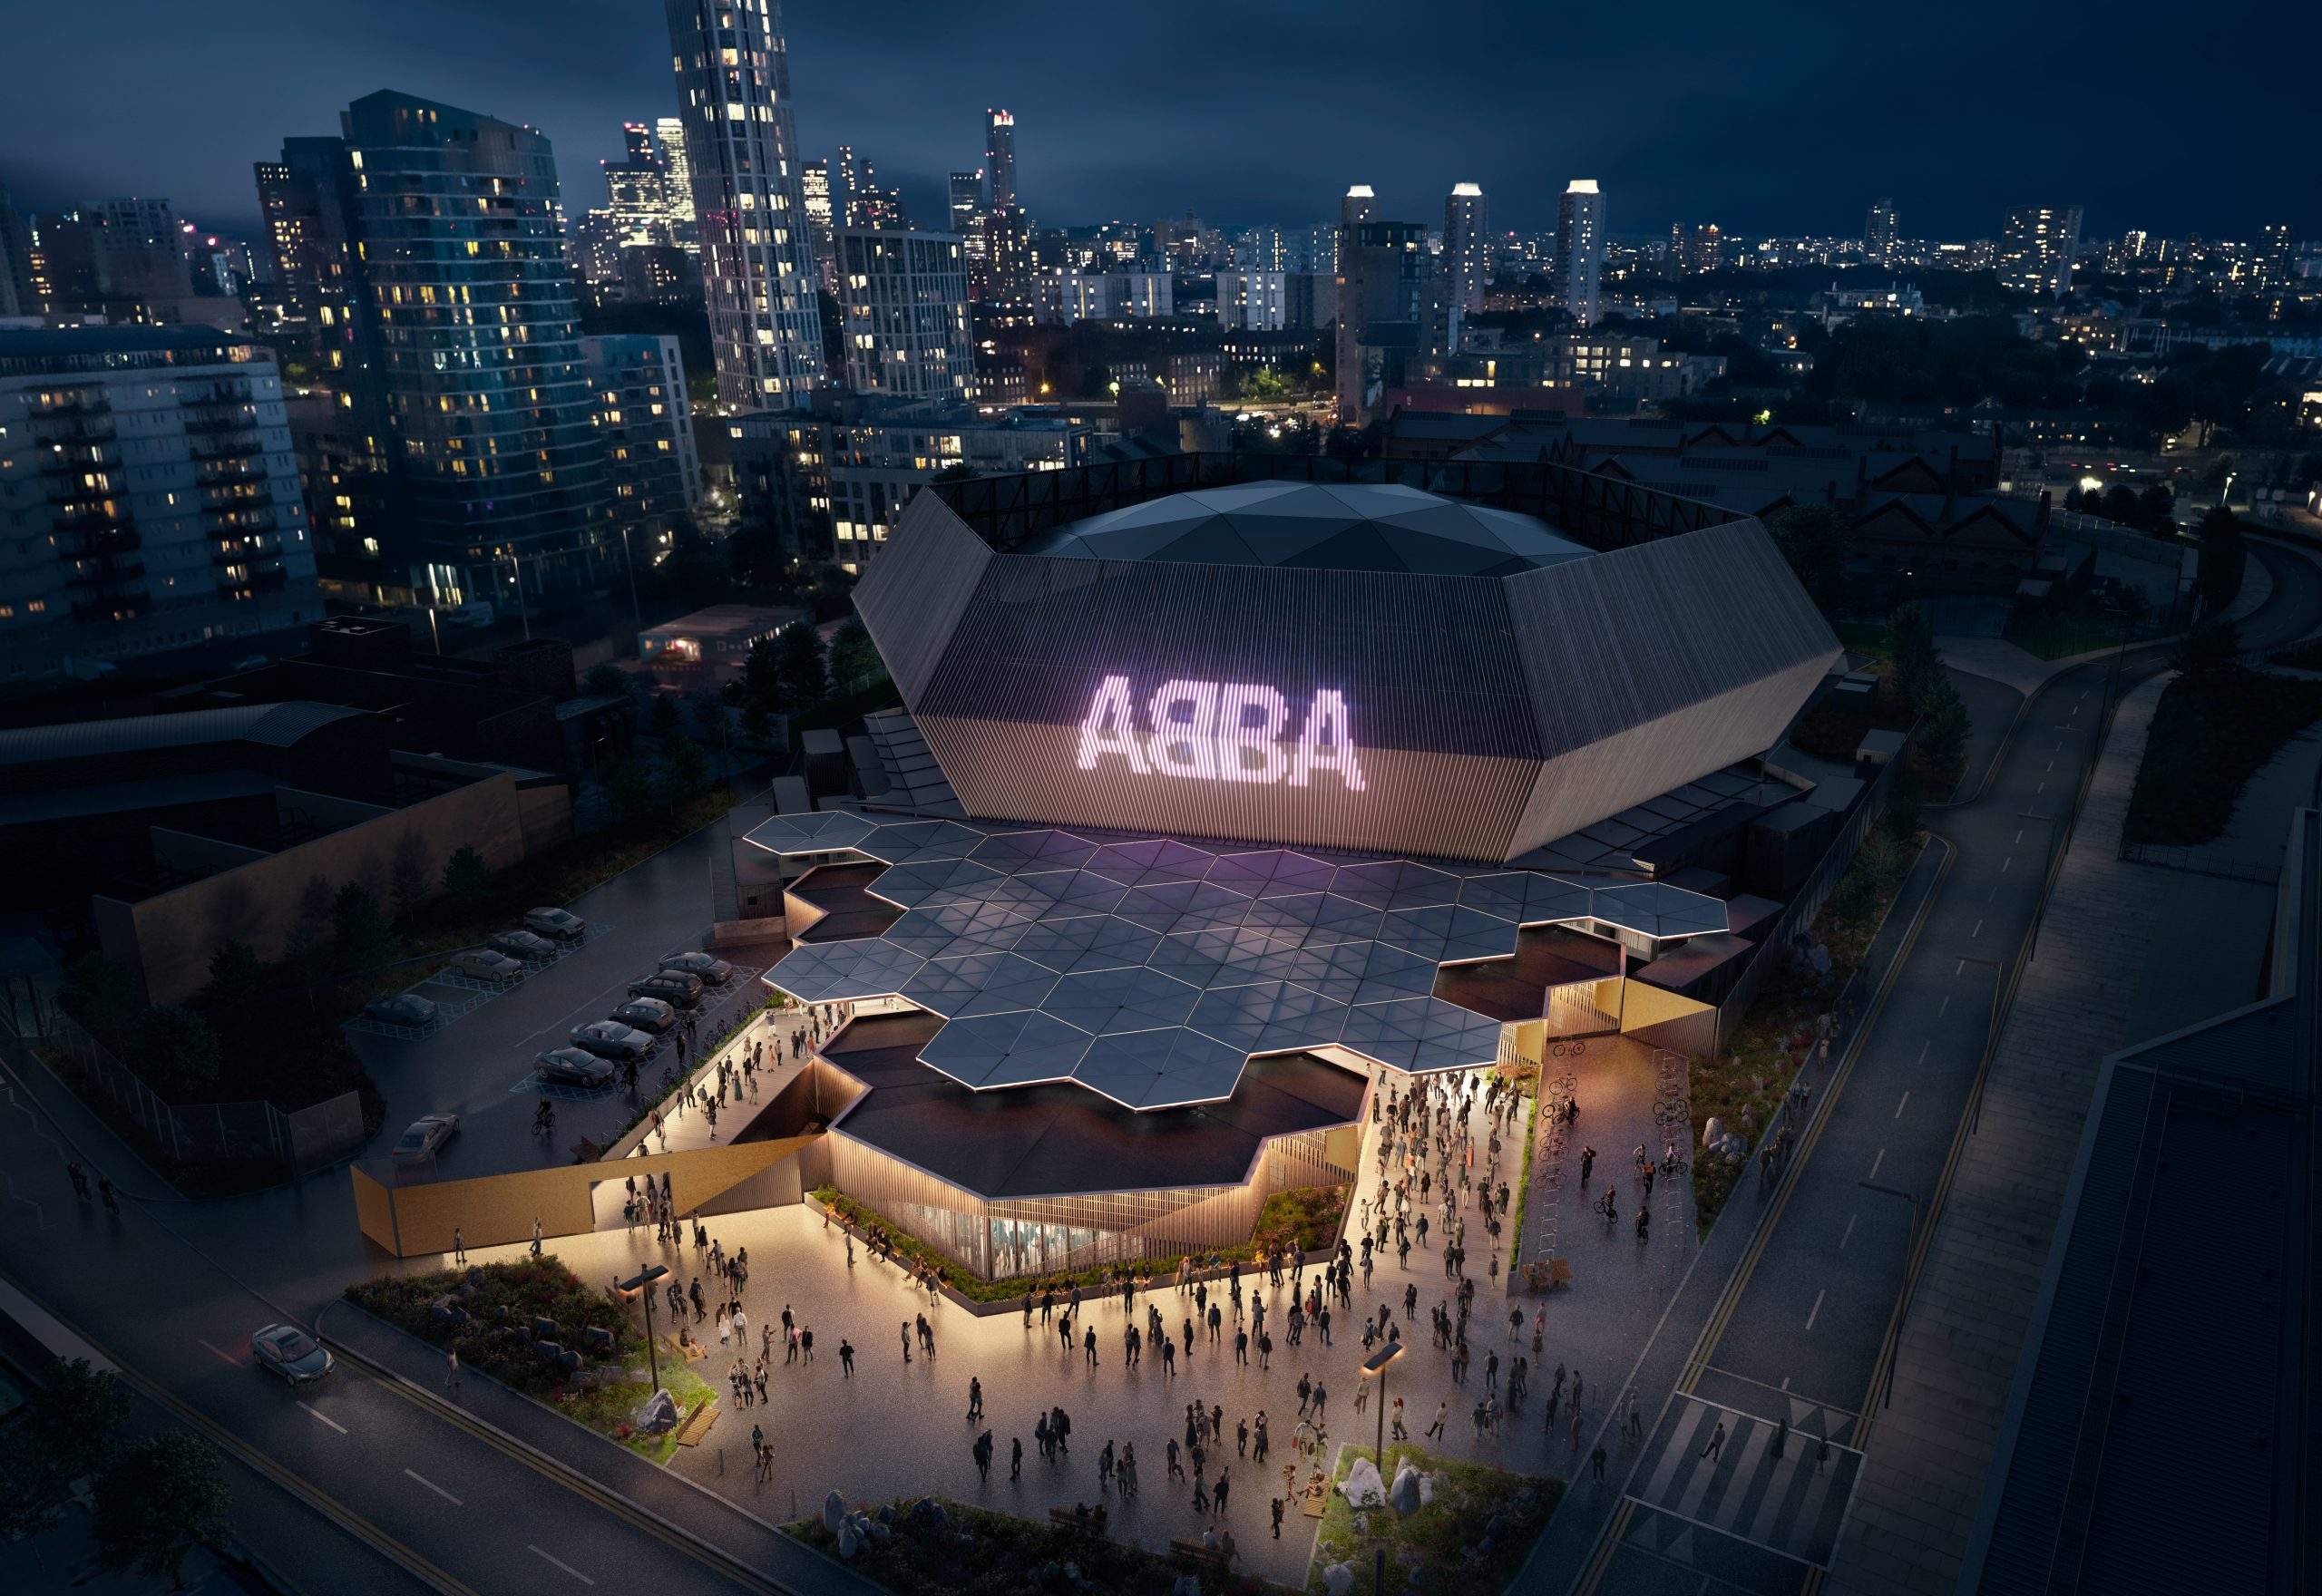 ABBA Arena - Illustration